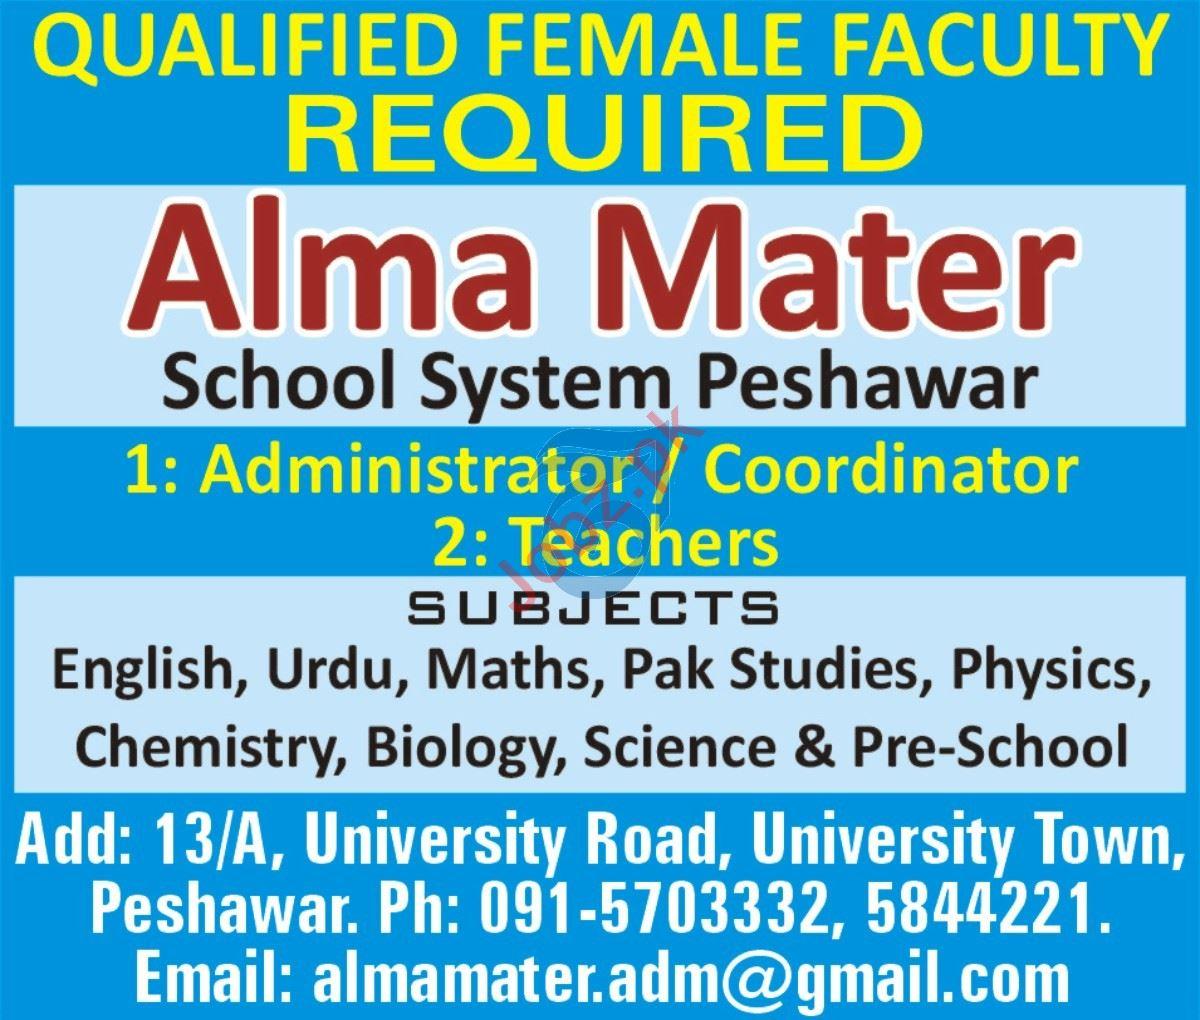 Alma Mater School System Peshawar Jobs 2021 for Coordinator